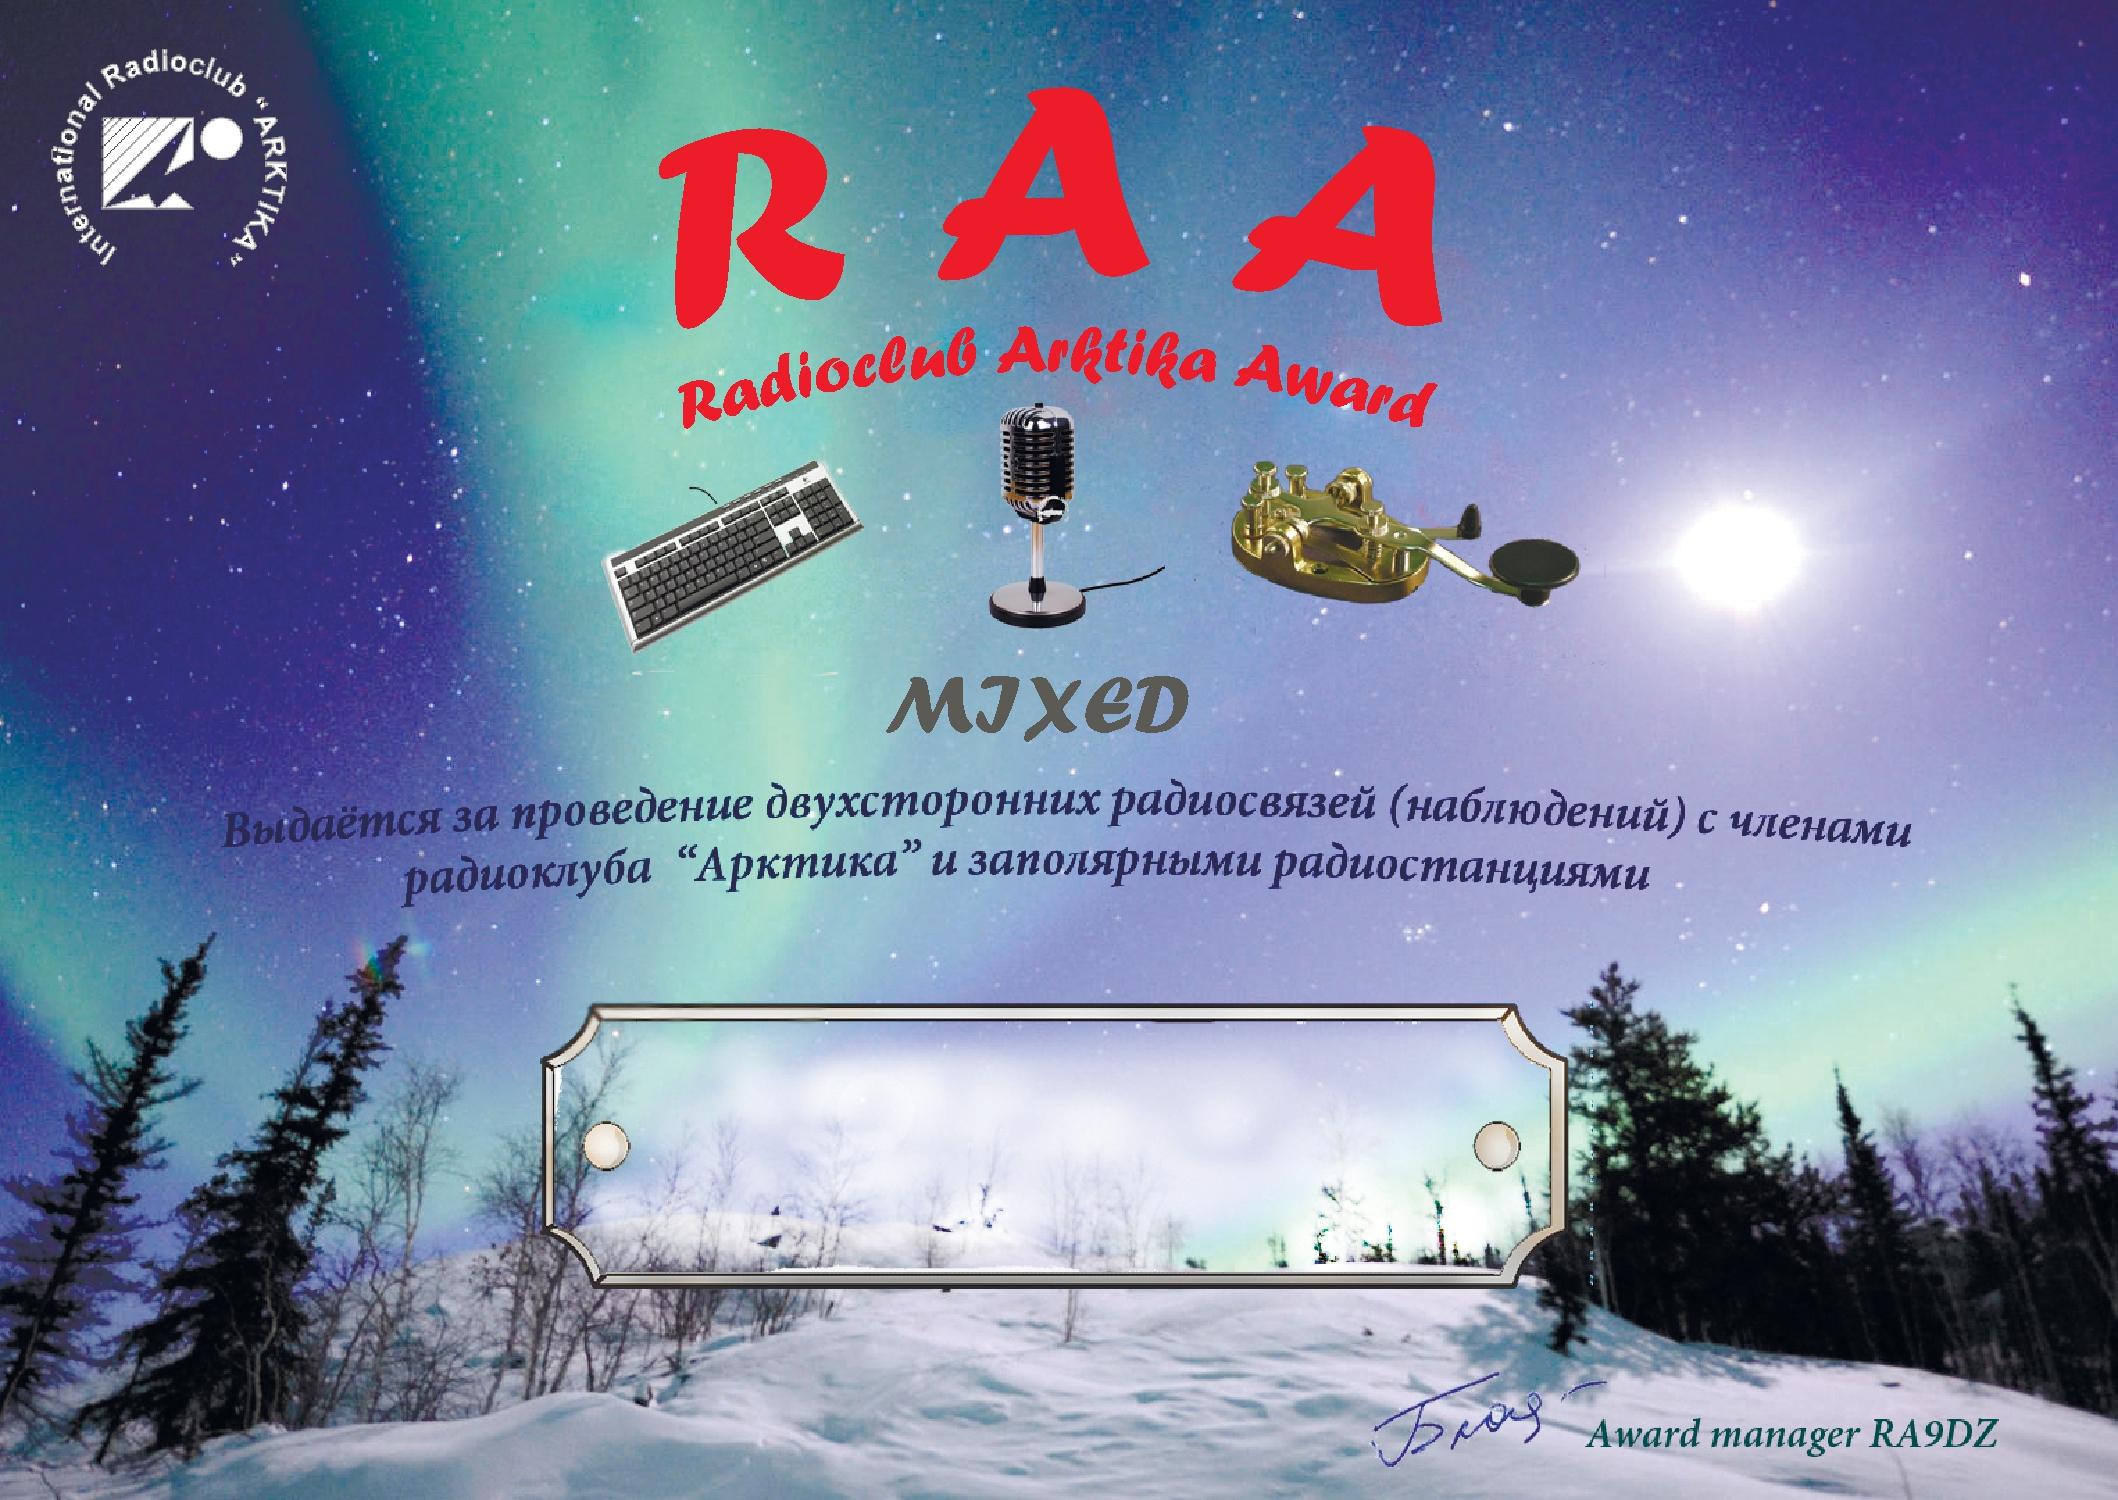 http://www.qrz.ru/awards/image/id/81